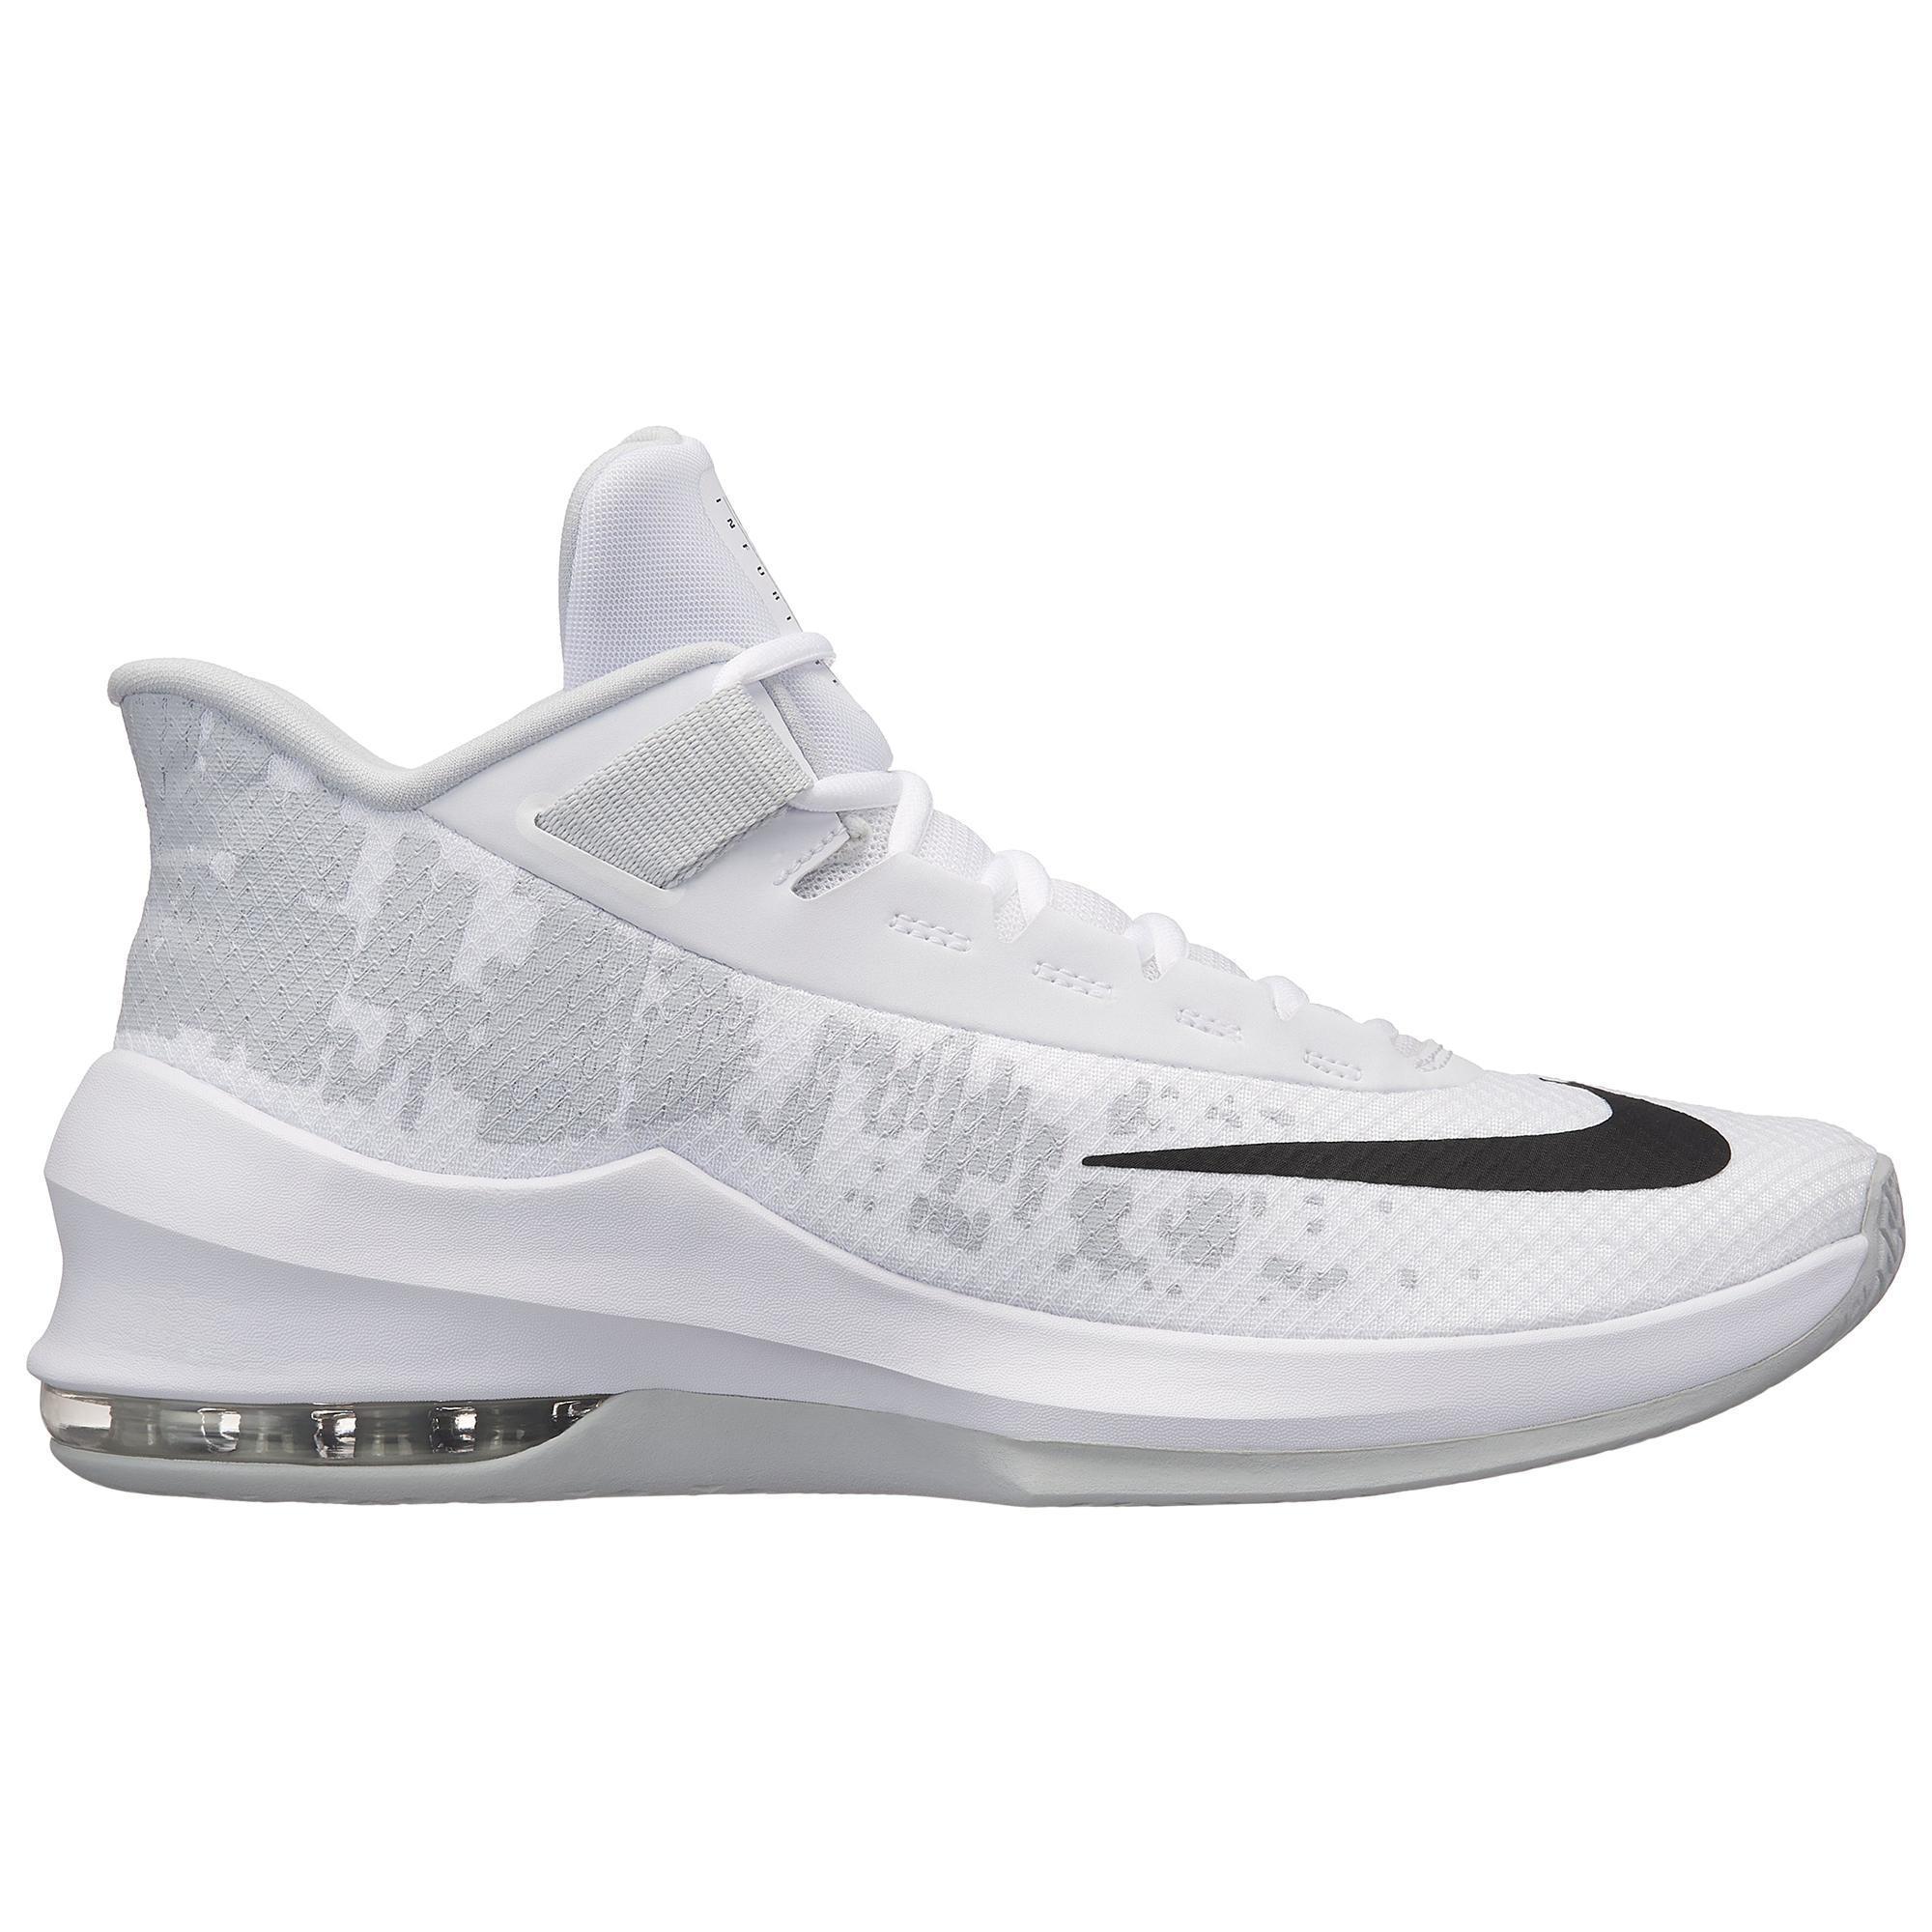 pretty nice 93123 6236b ZAPATILLAS DE BALONCESTO AIR MAX INFURIATE 2 blanco negro Nike   Decathlon